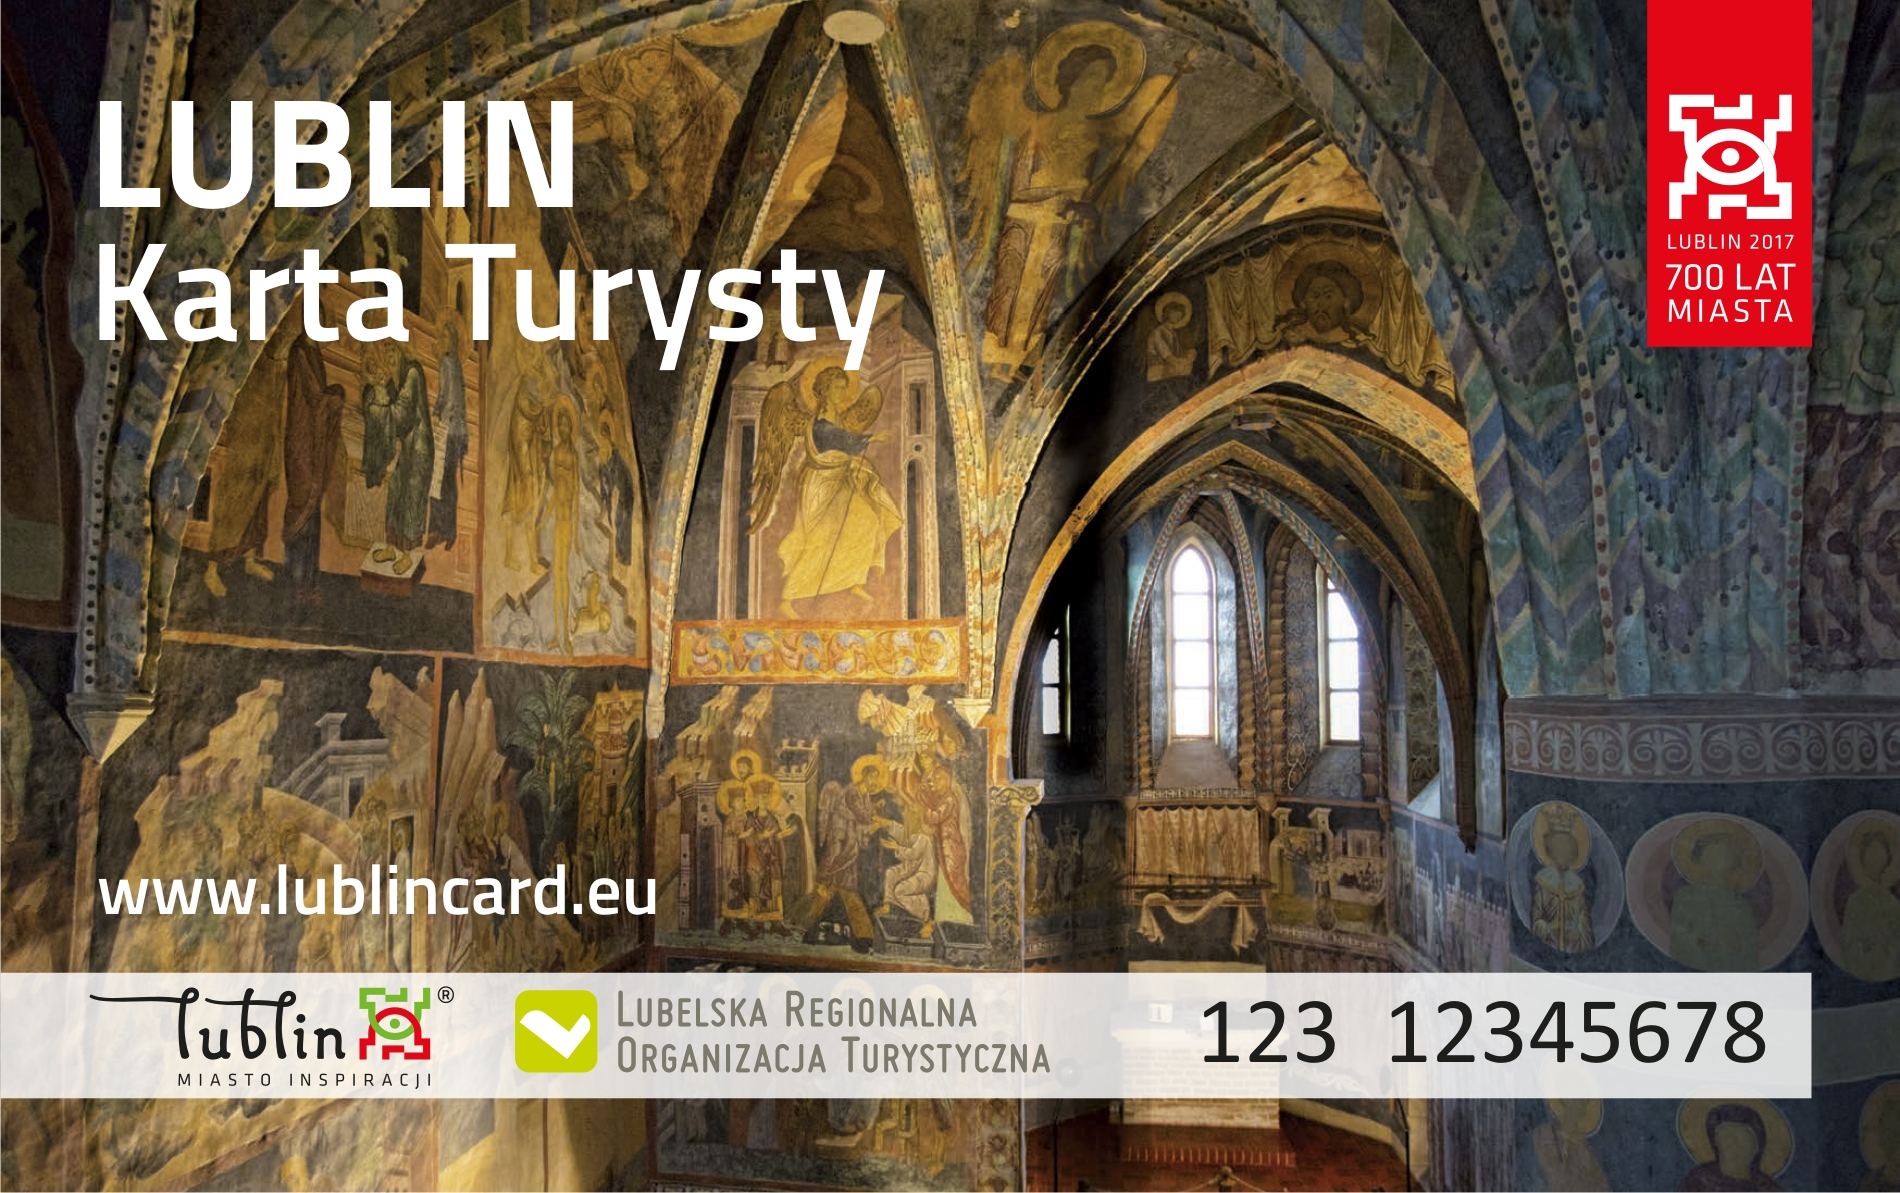 Lublin Karta Turysty